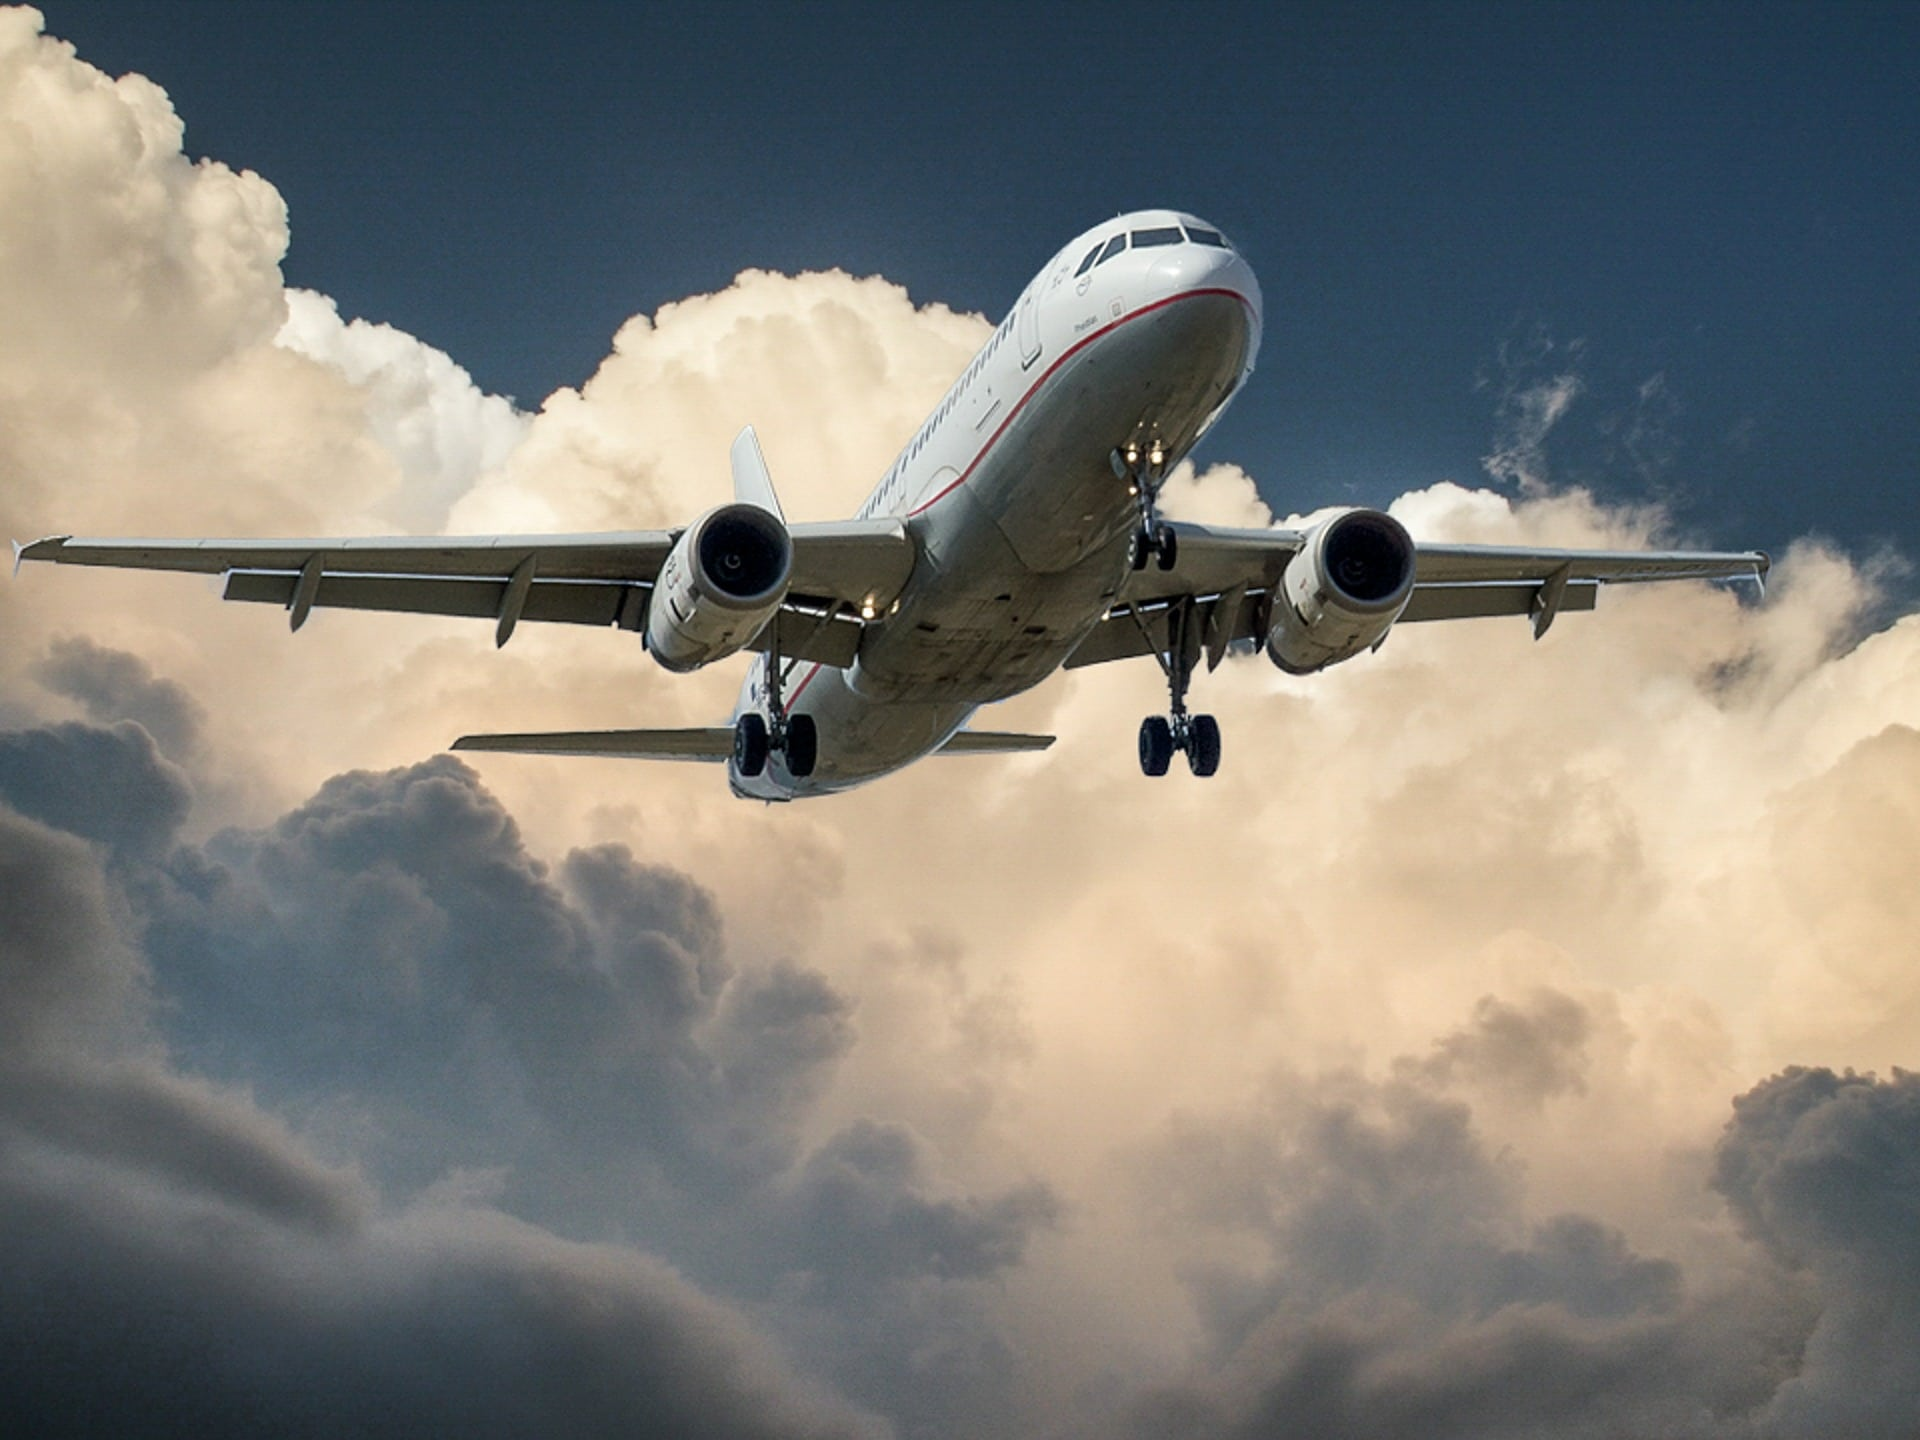 Jet Aircraft representing West Palm Beach Aviation